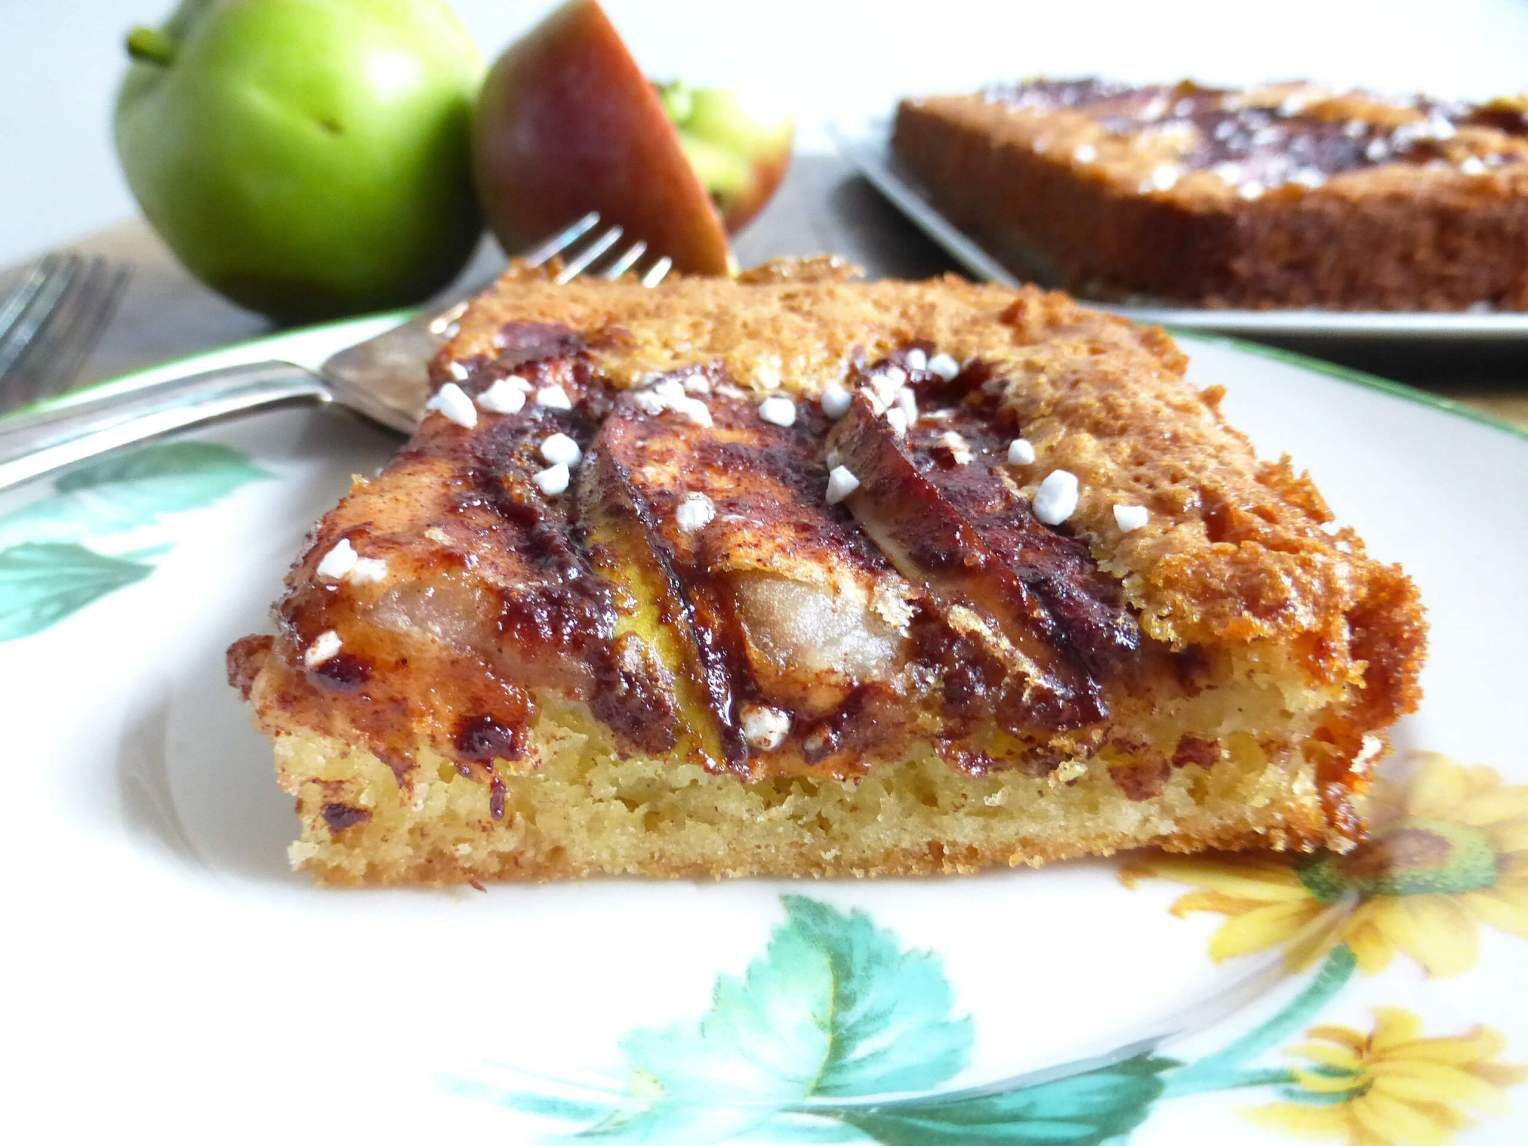 Simple Appelkaka Swedish Apple Cake Recipe Apple Cake Swedish Apple Cake Recipe Scandinavian Food